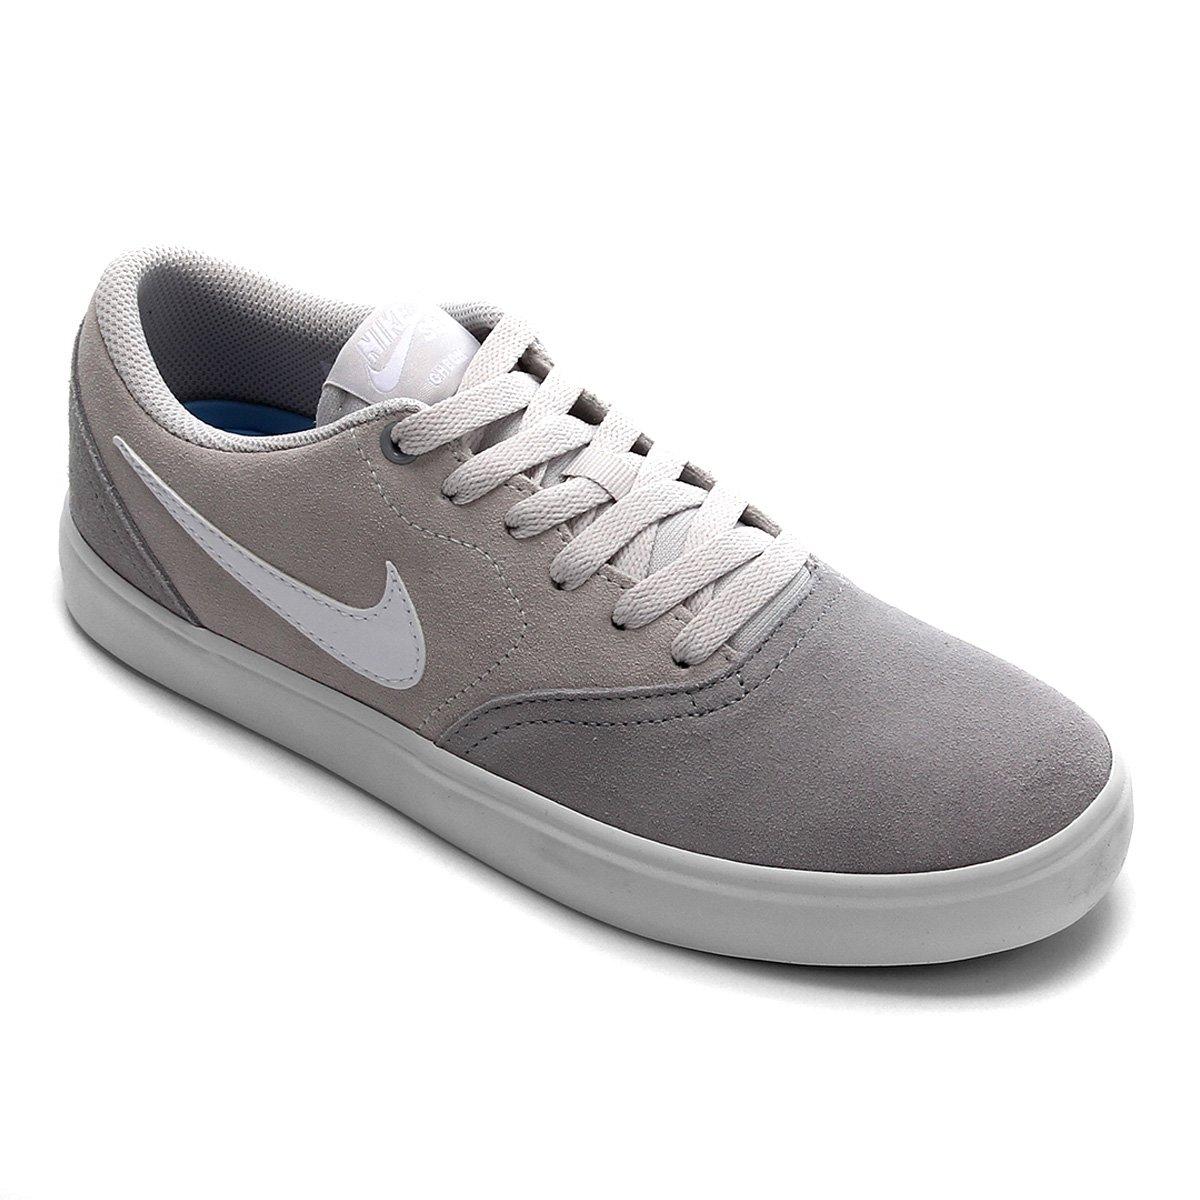 Tênis Nike Sb Check Solar Feminino Cinza E Preto